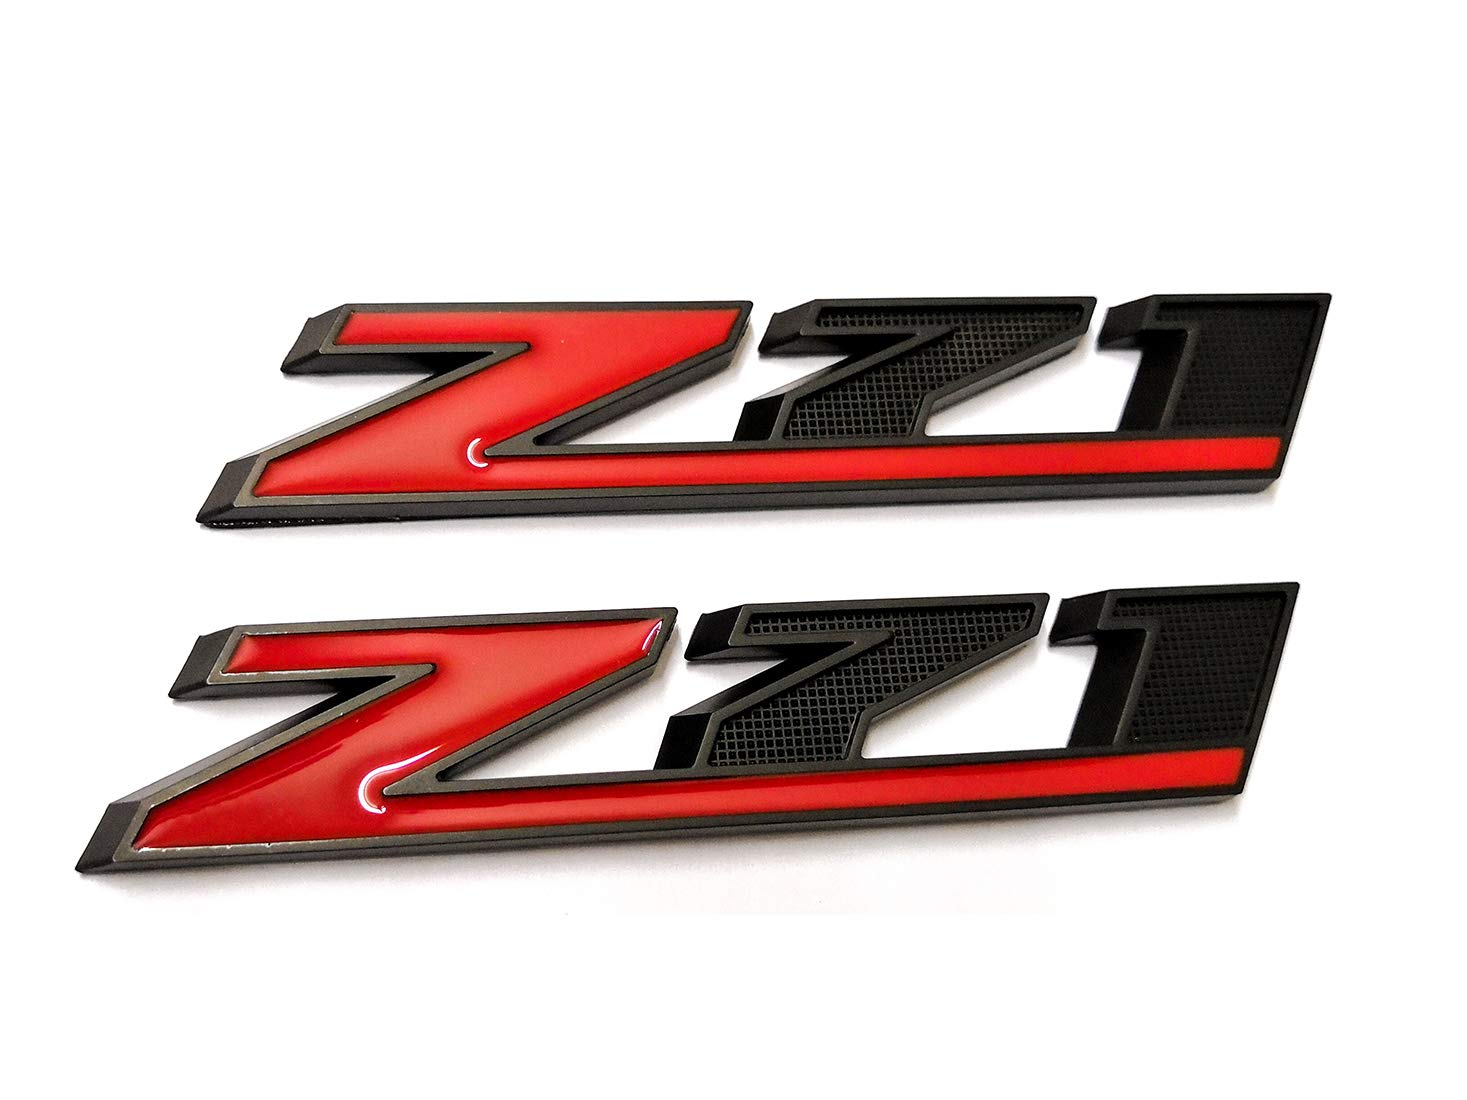 2pcs Black Z71 Emblem Badges 3D Replacement for GM Chevy Silverado 1500 2500HD Sierra Tahoe Suburban Decals Black